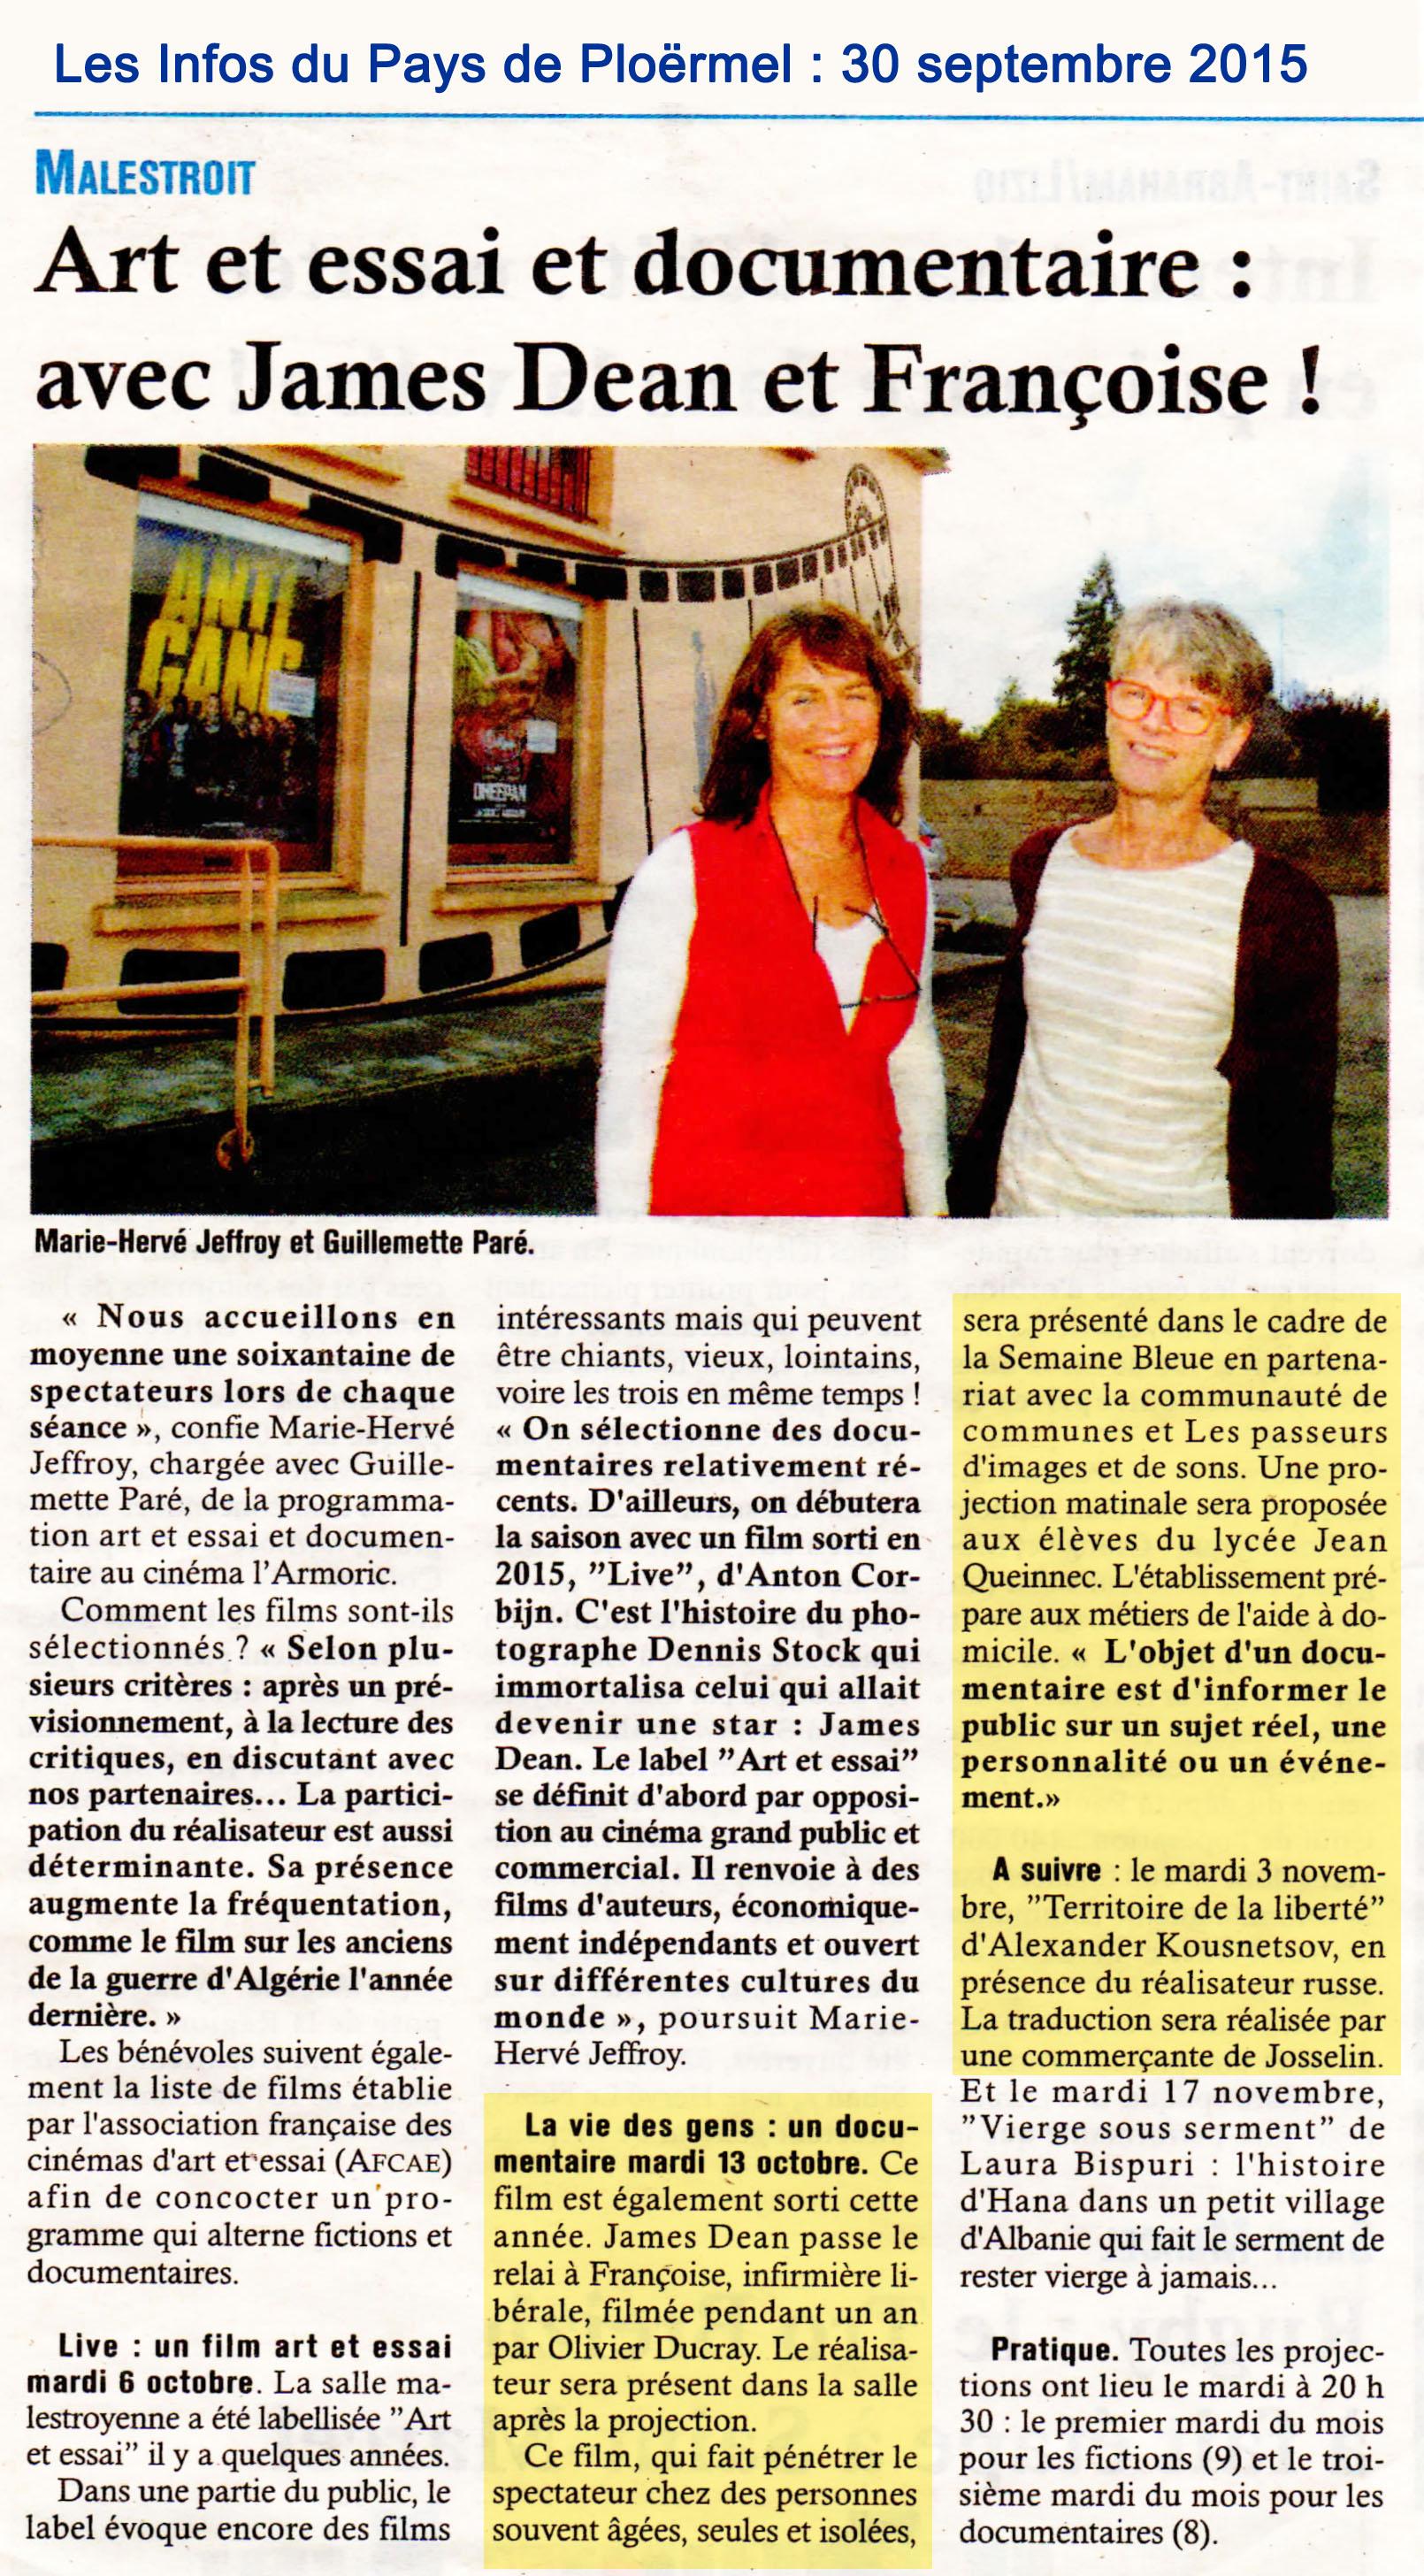 2015 09 30 La vie des gens Les Infos.jpg